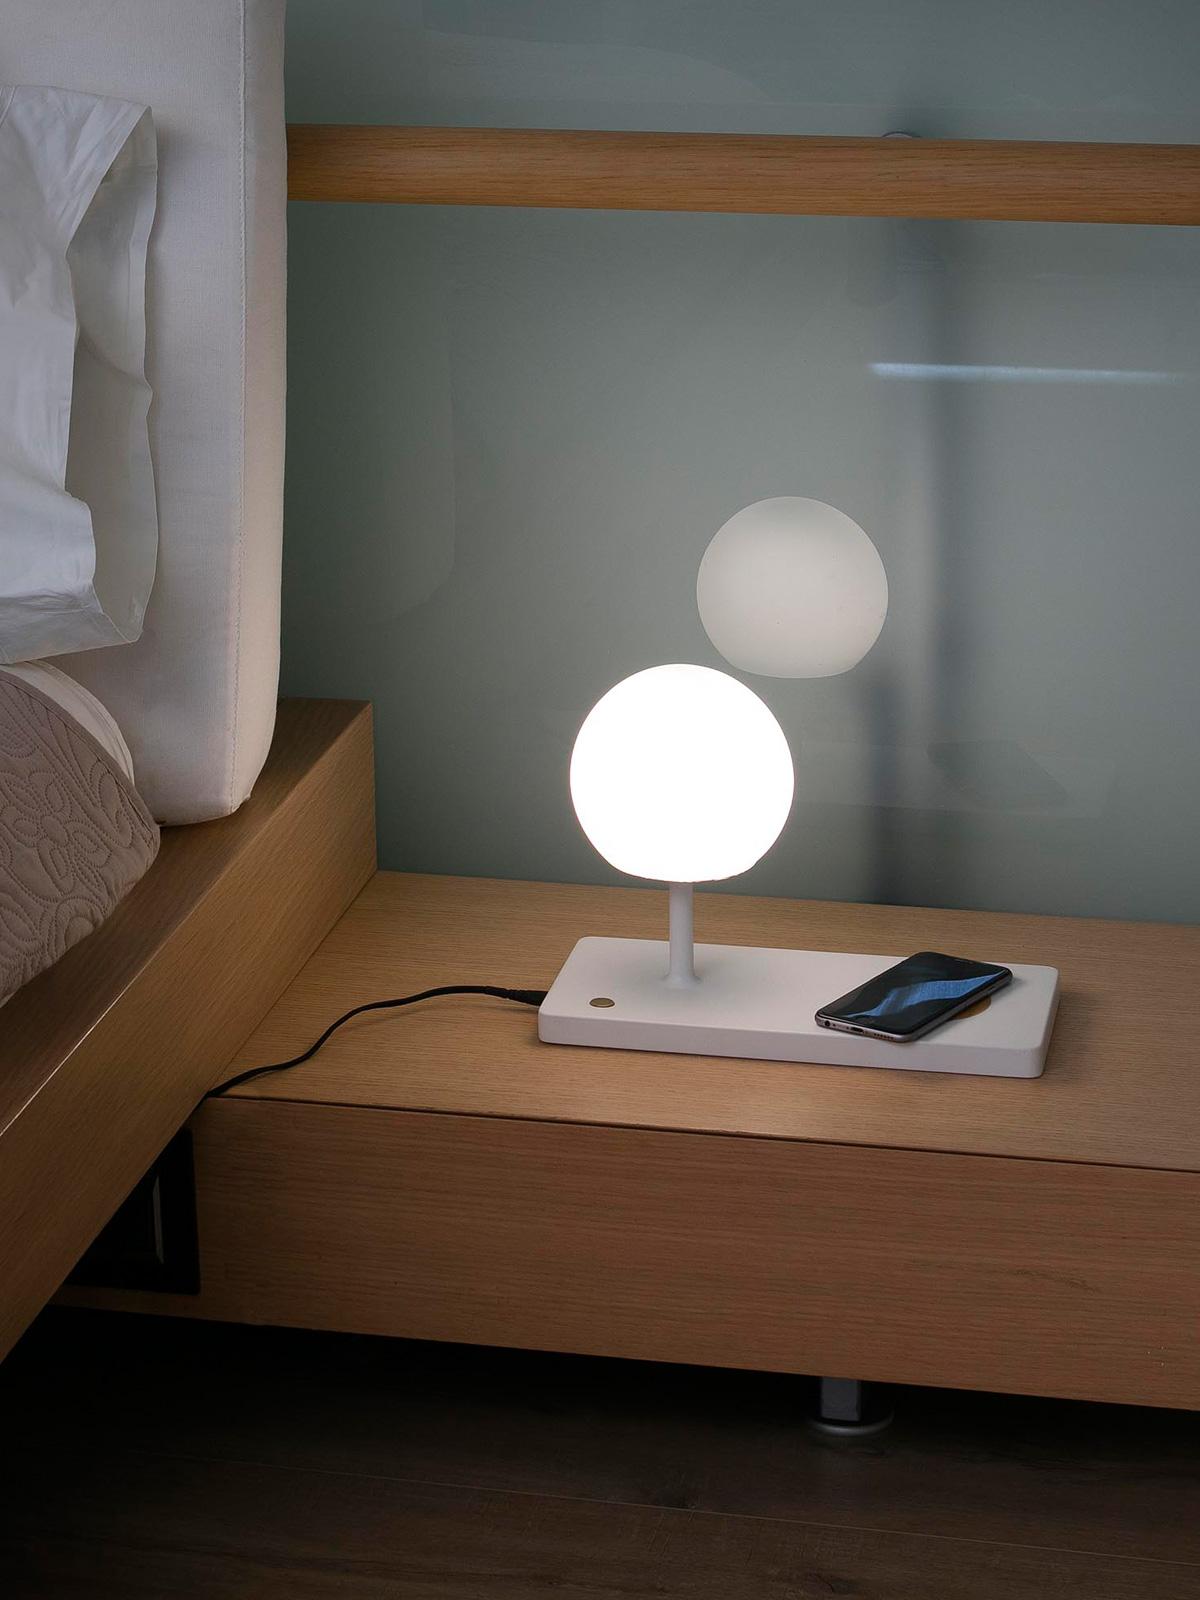 DesignOrt Blog: Multifunktionale Designerleuchten LED Tischlampe Niko Faro